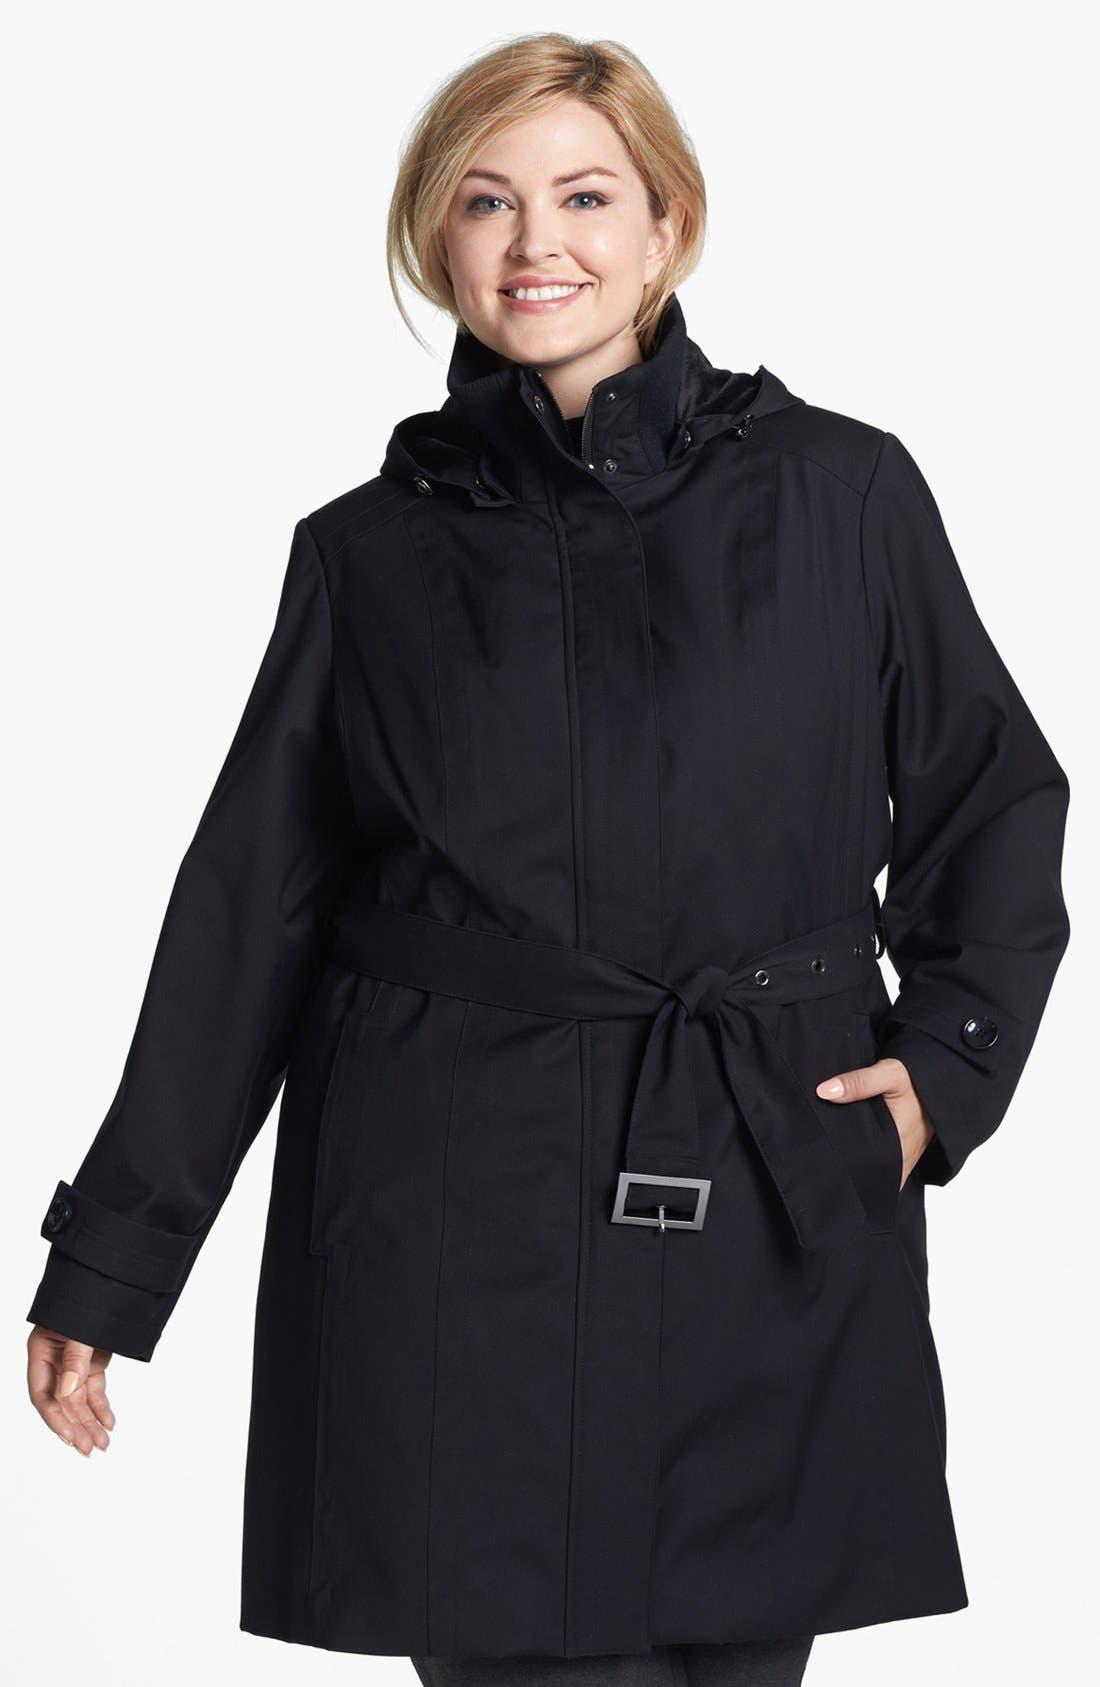 Main Image - Kristen Blake Knit Collar Raincoat with Detachable Hood & Liner (Plus Size)